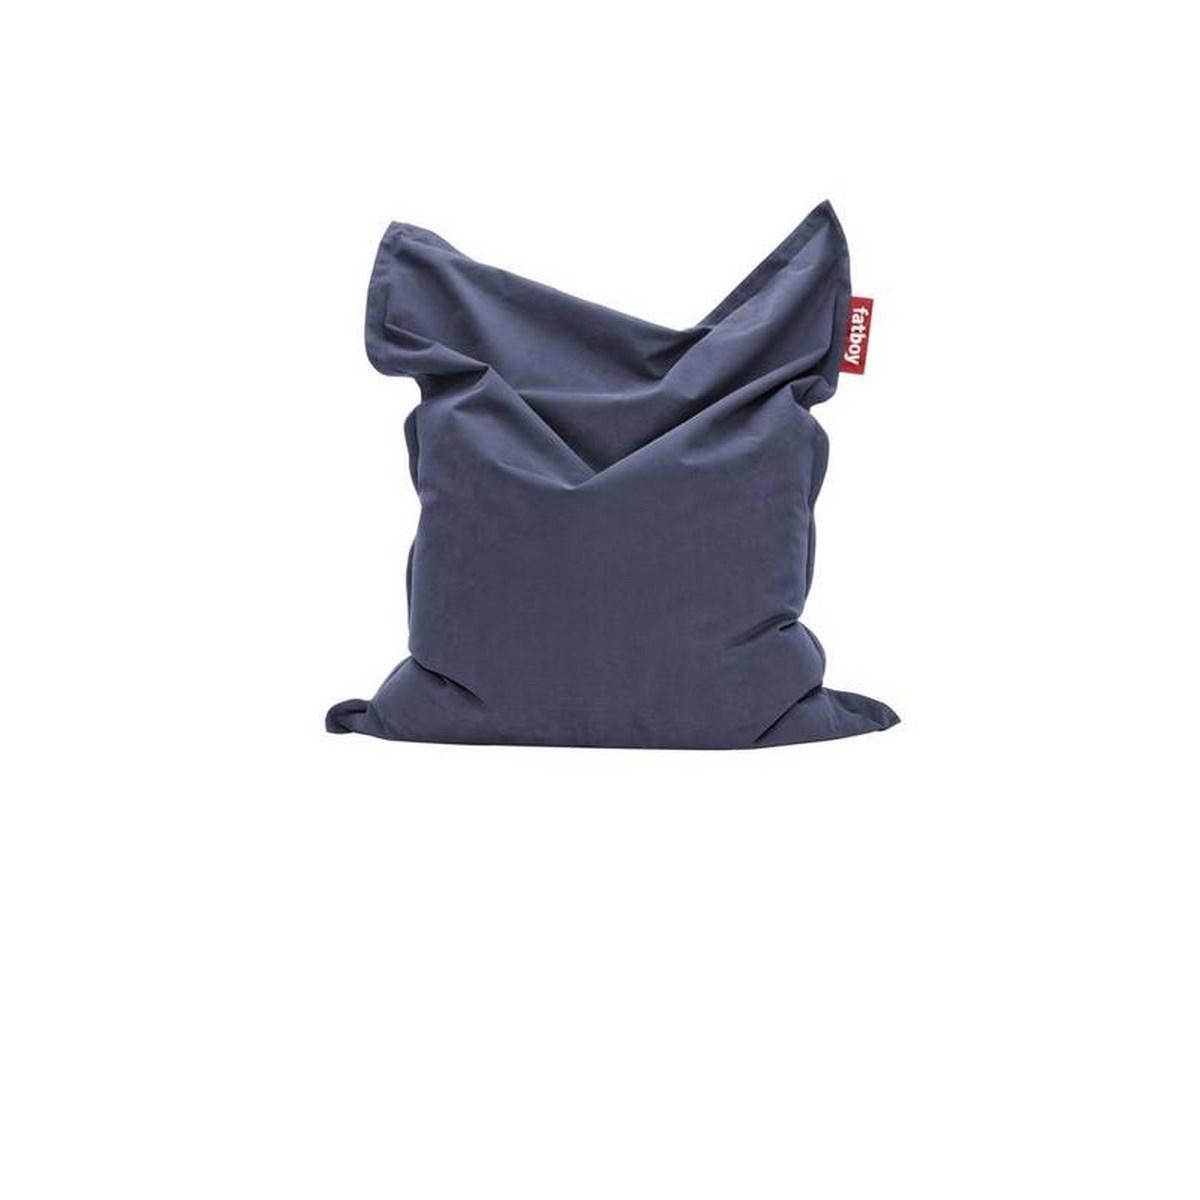 Fatboy® the original stonewashed dark blue